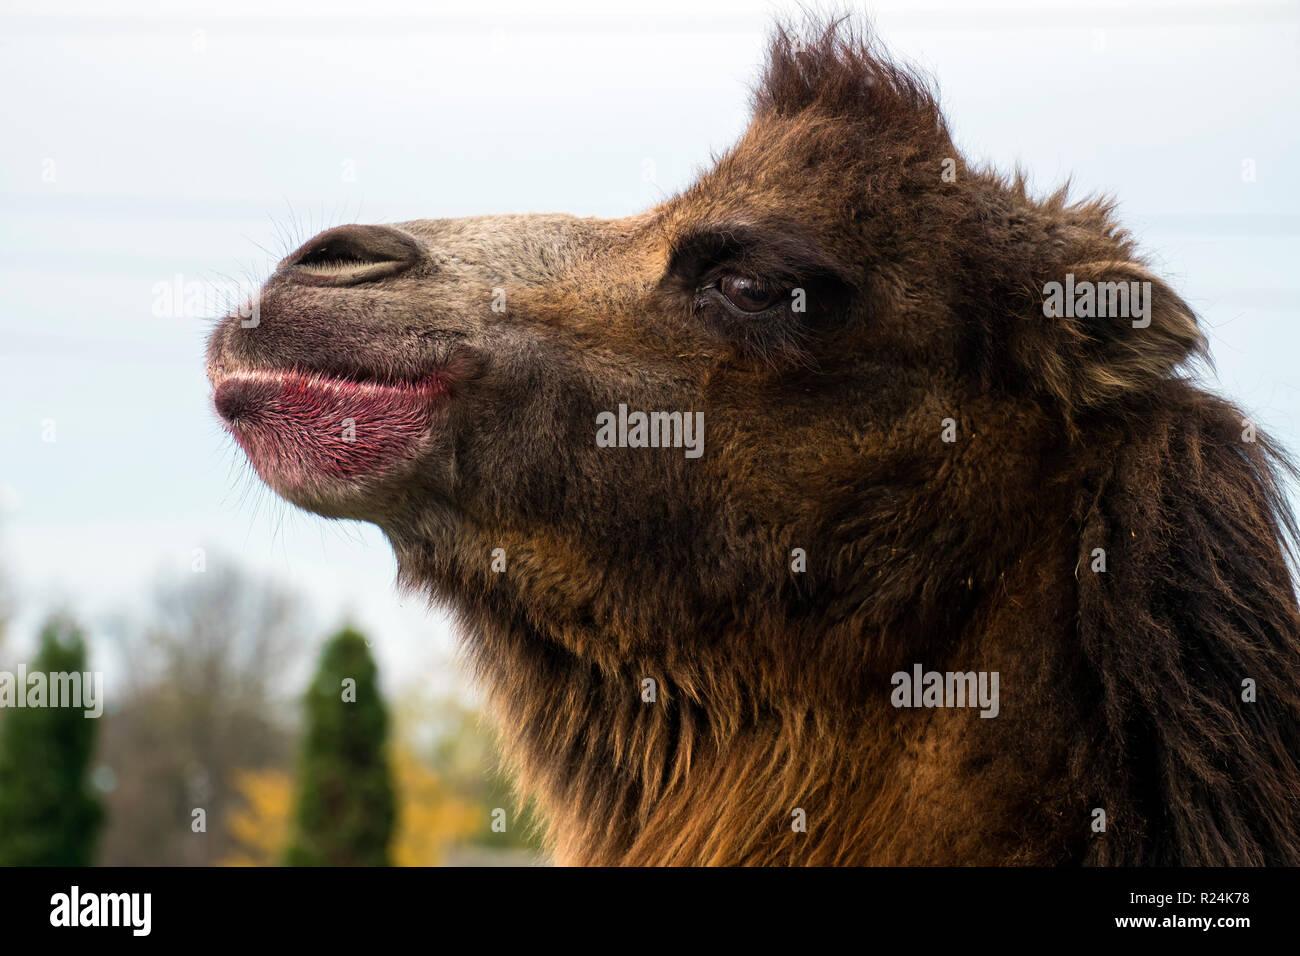 Head of Bactrian camel in half-face (Camelus bactrianus) - Stock Image